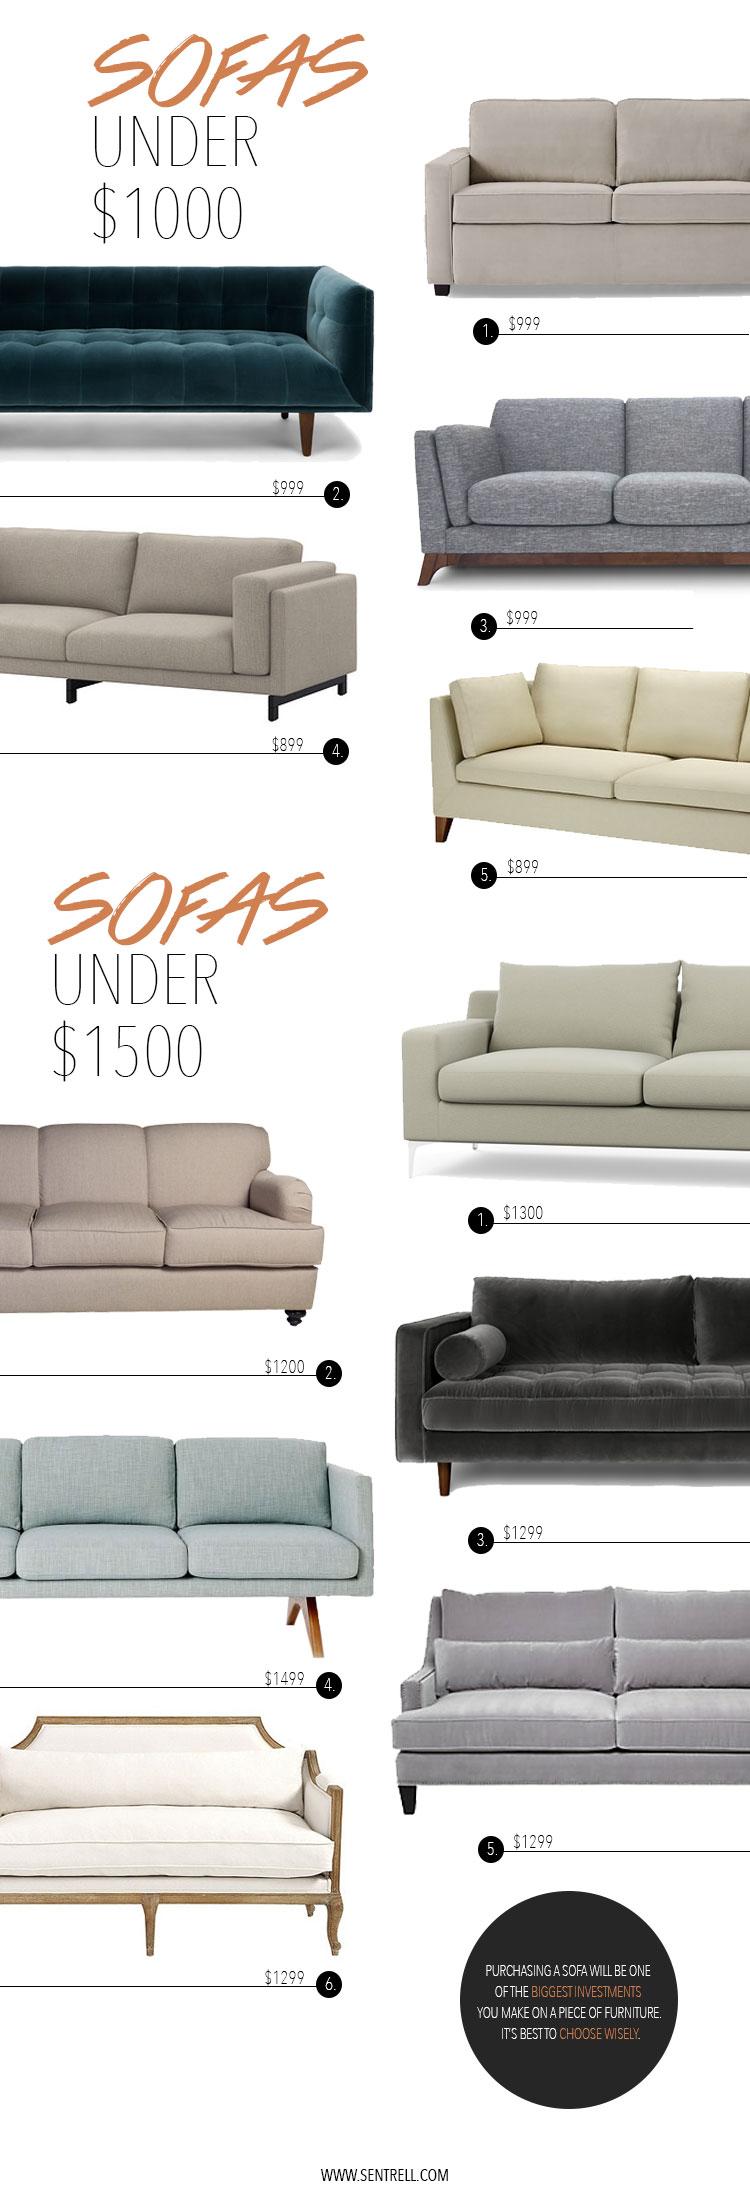 Sofas Under $1000 and Sofas Under $1500